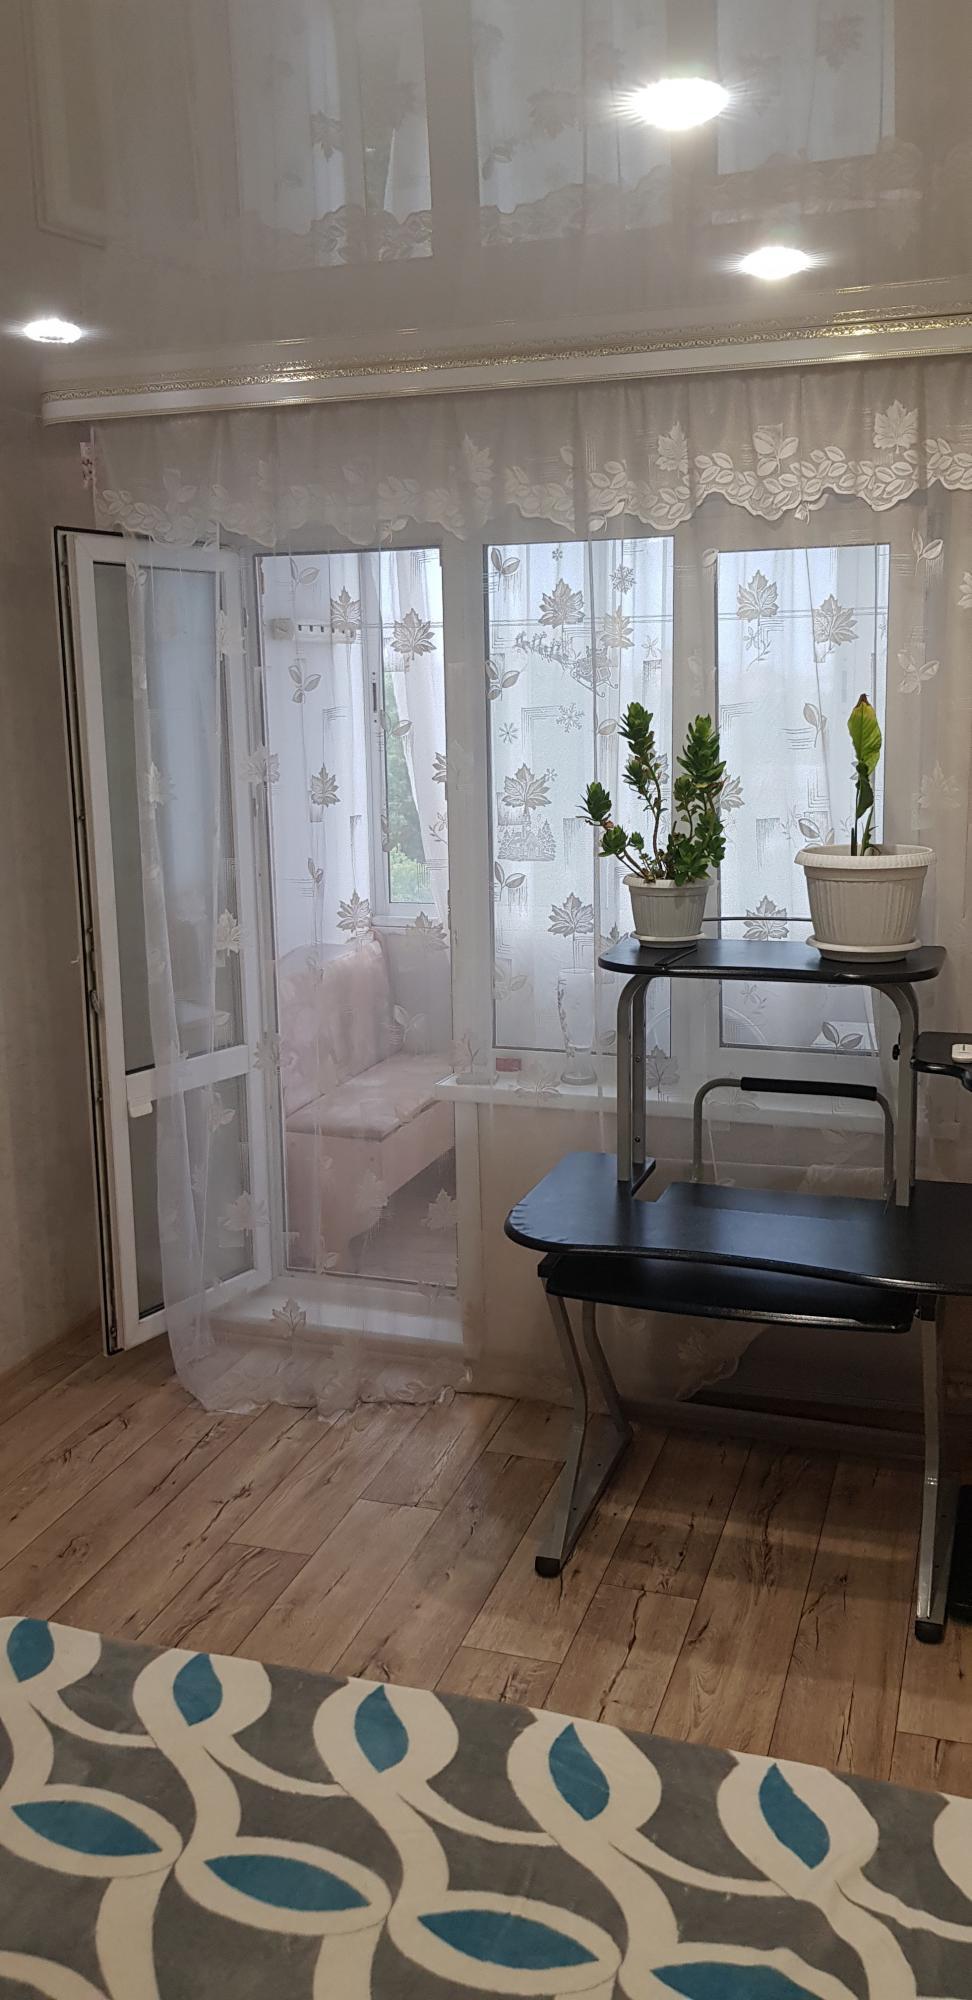 2к квартира улица Краснодарская, 3 | 18000 | аренда в Красноярске фото 1